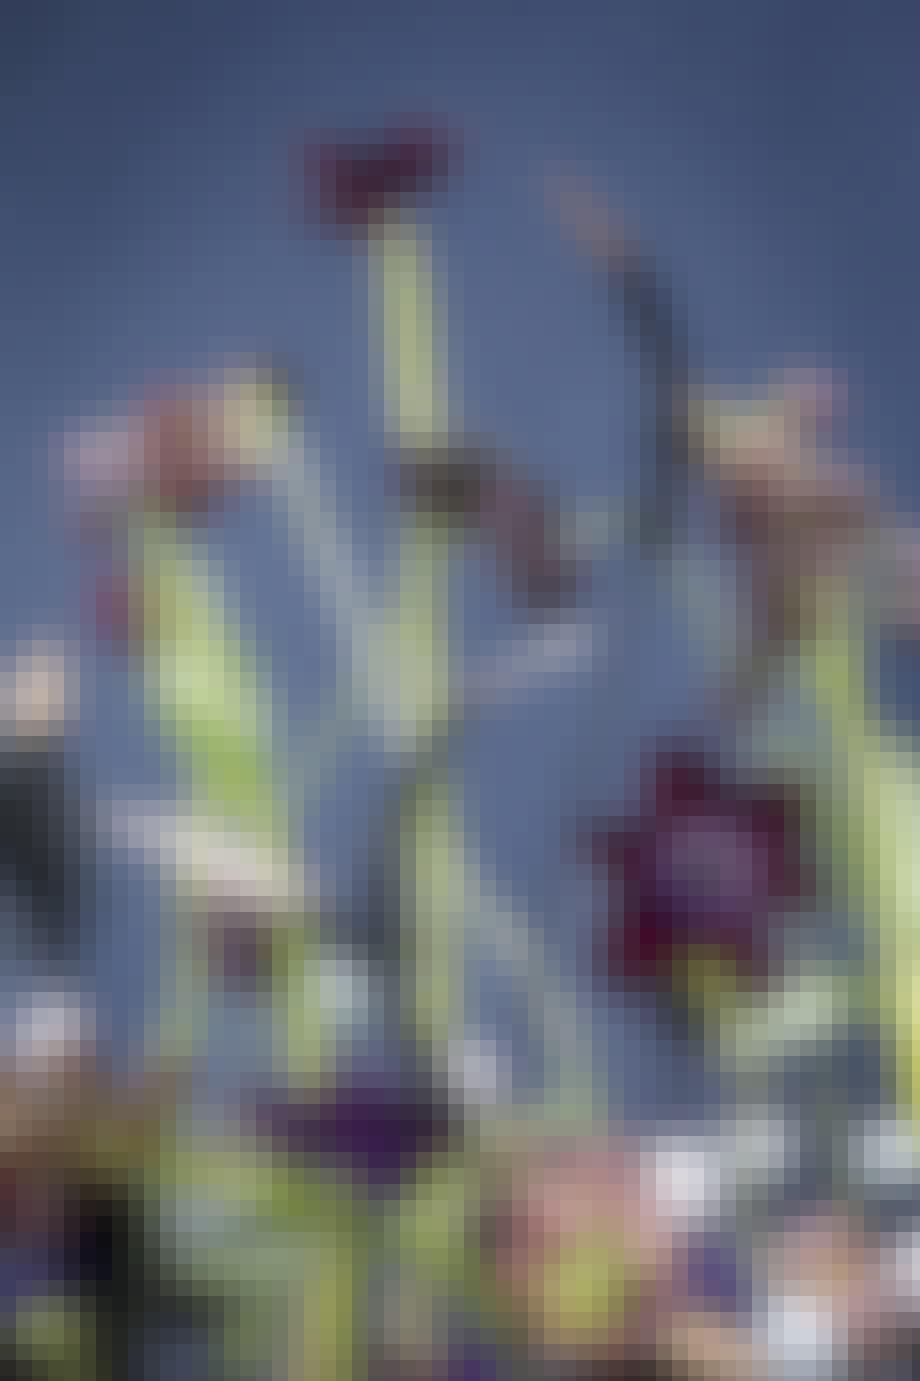 blomsterdekoration blomster vibeæg annette von einem